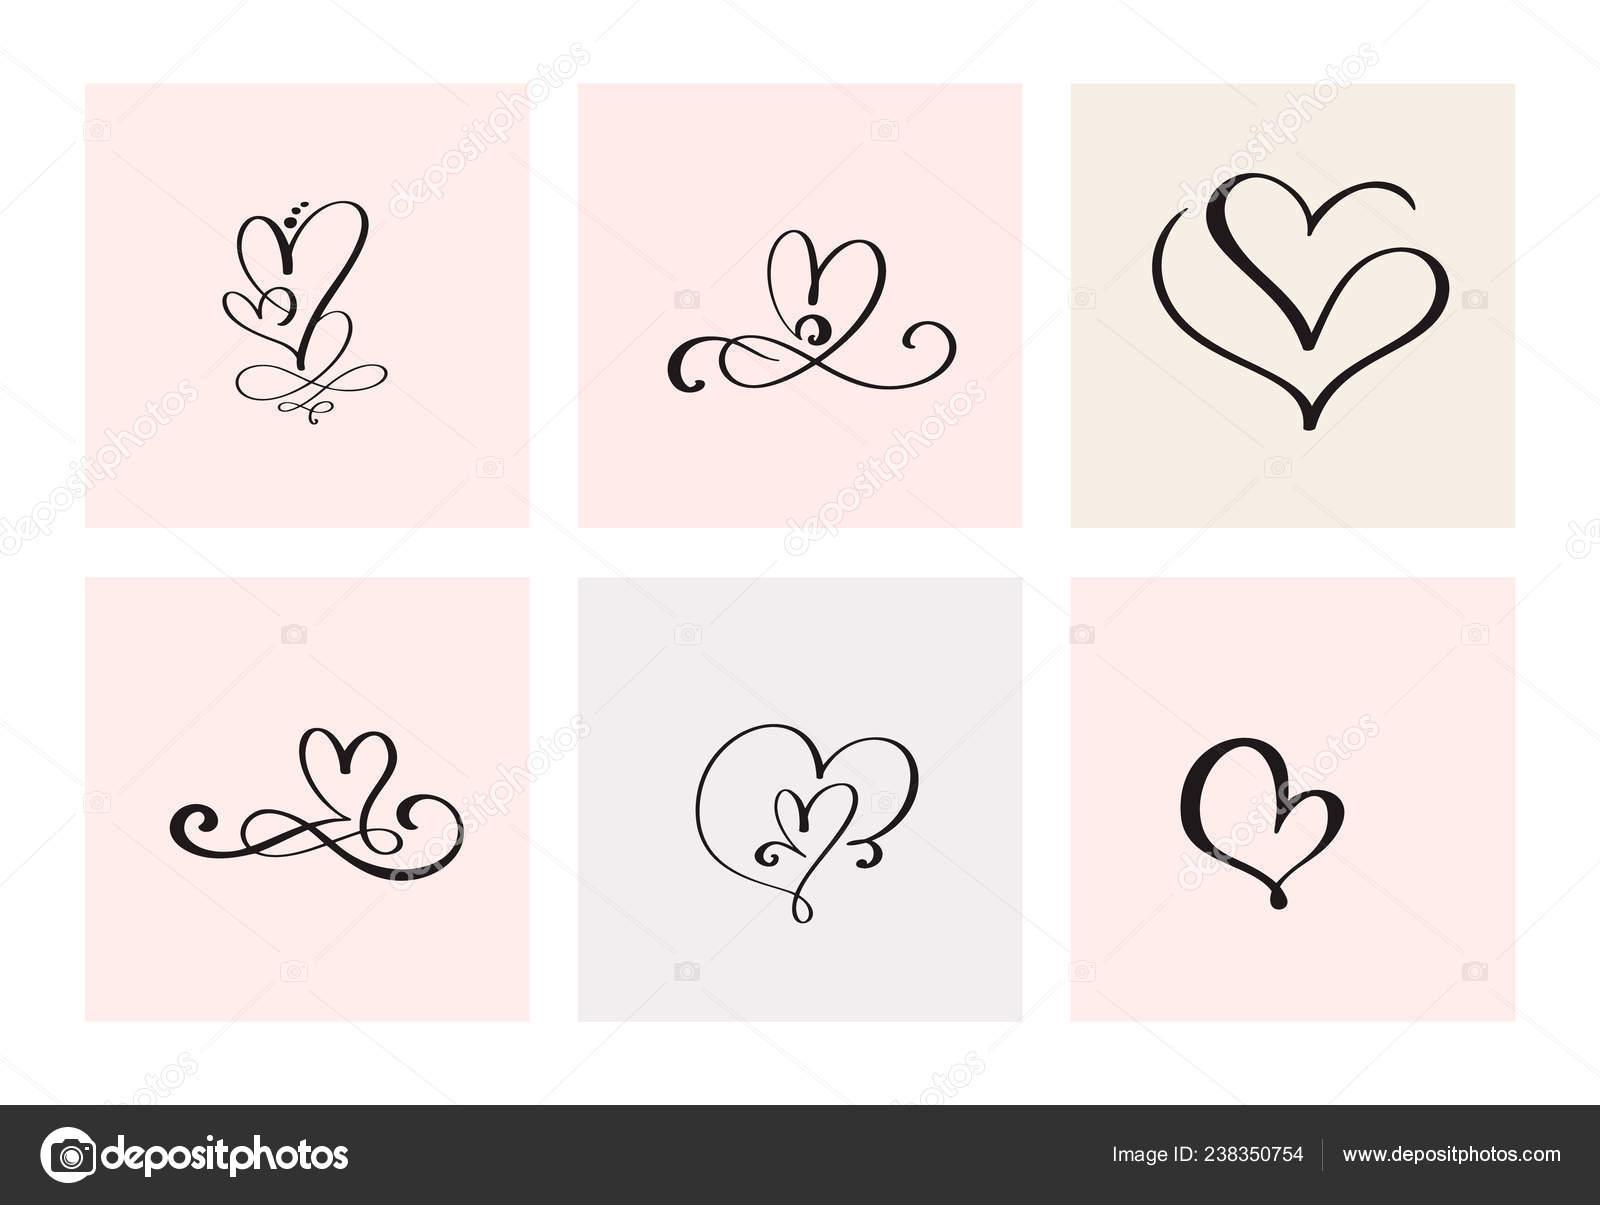 Sada Sesti Vintage Vektor Valentyn Rukou Kreslene Kaligraficke Srdce